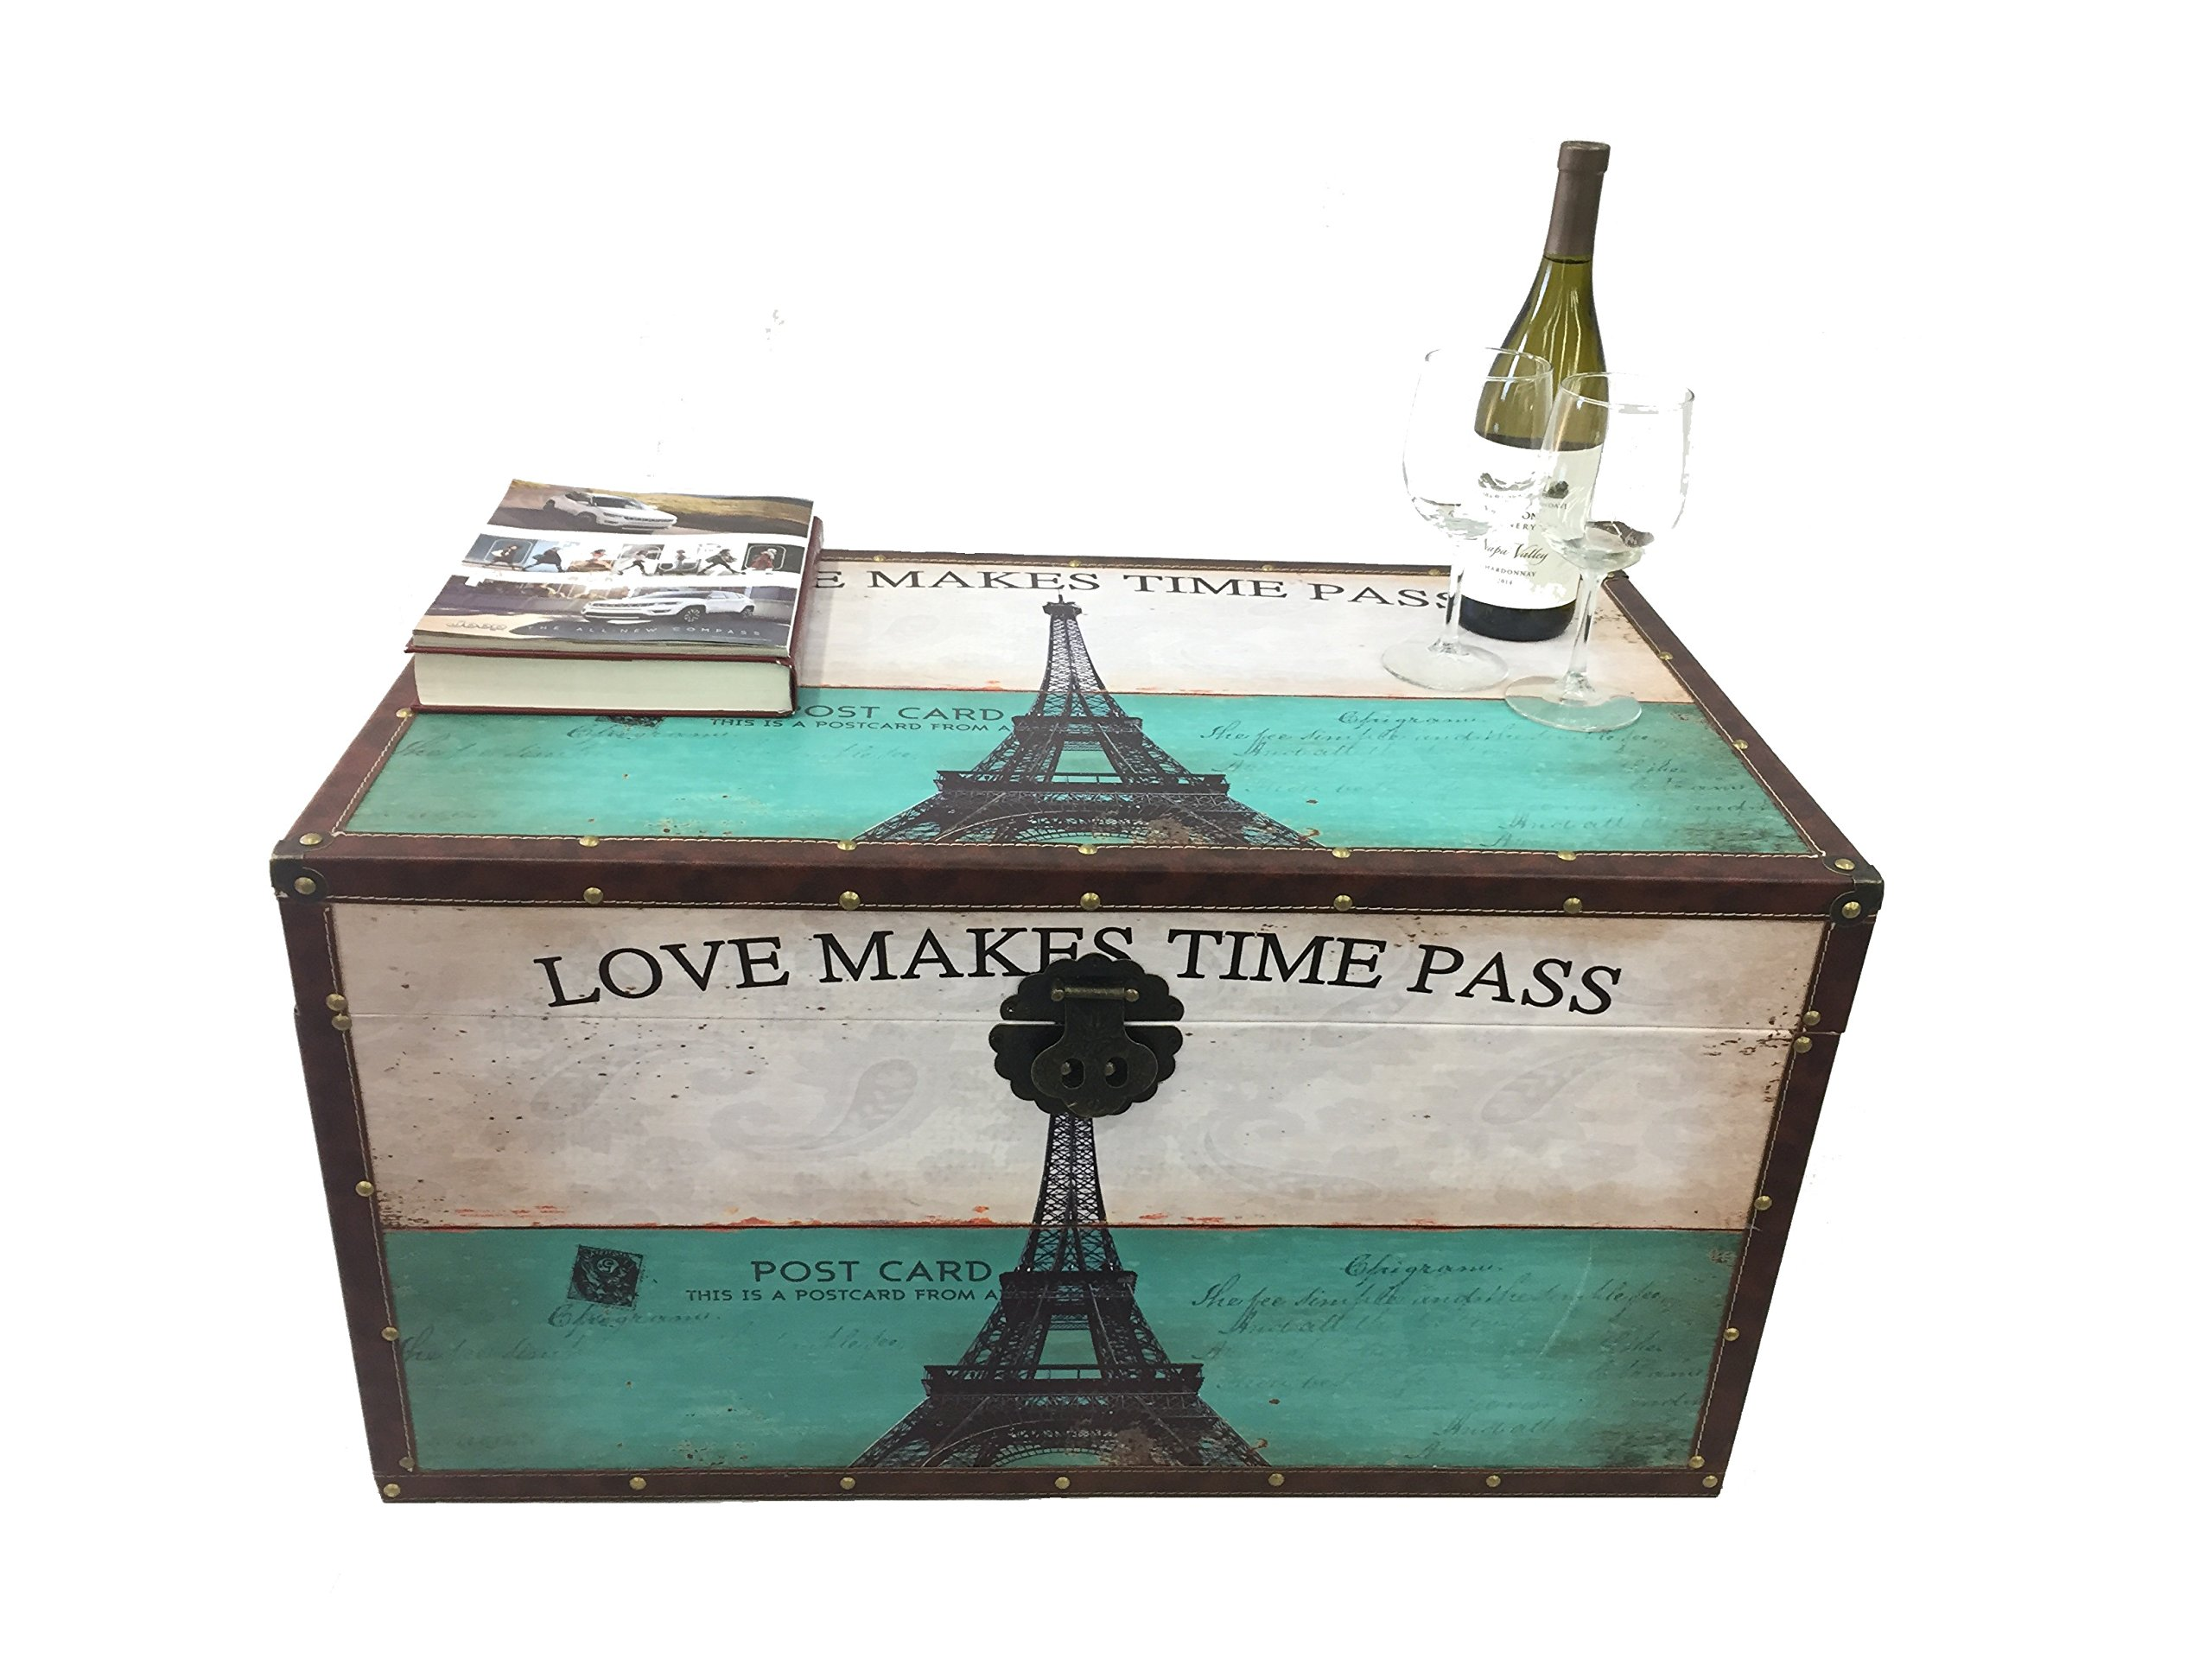 Styled Shopping Paris Post Card Steamer Trunk Wood Storage Wooden Treasure Chest - Medium Trunk